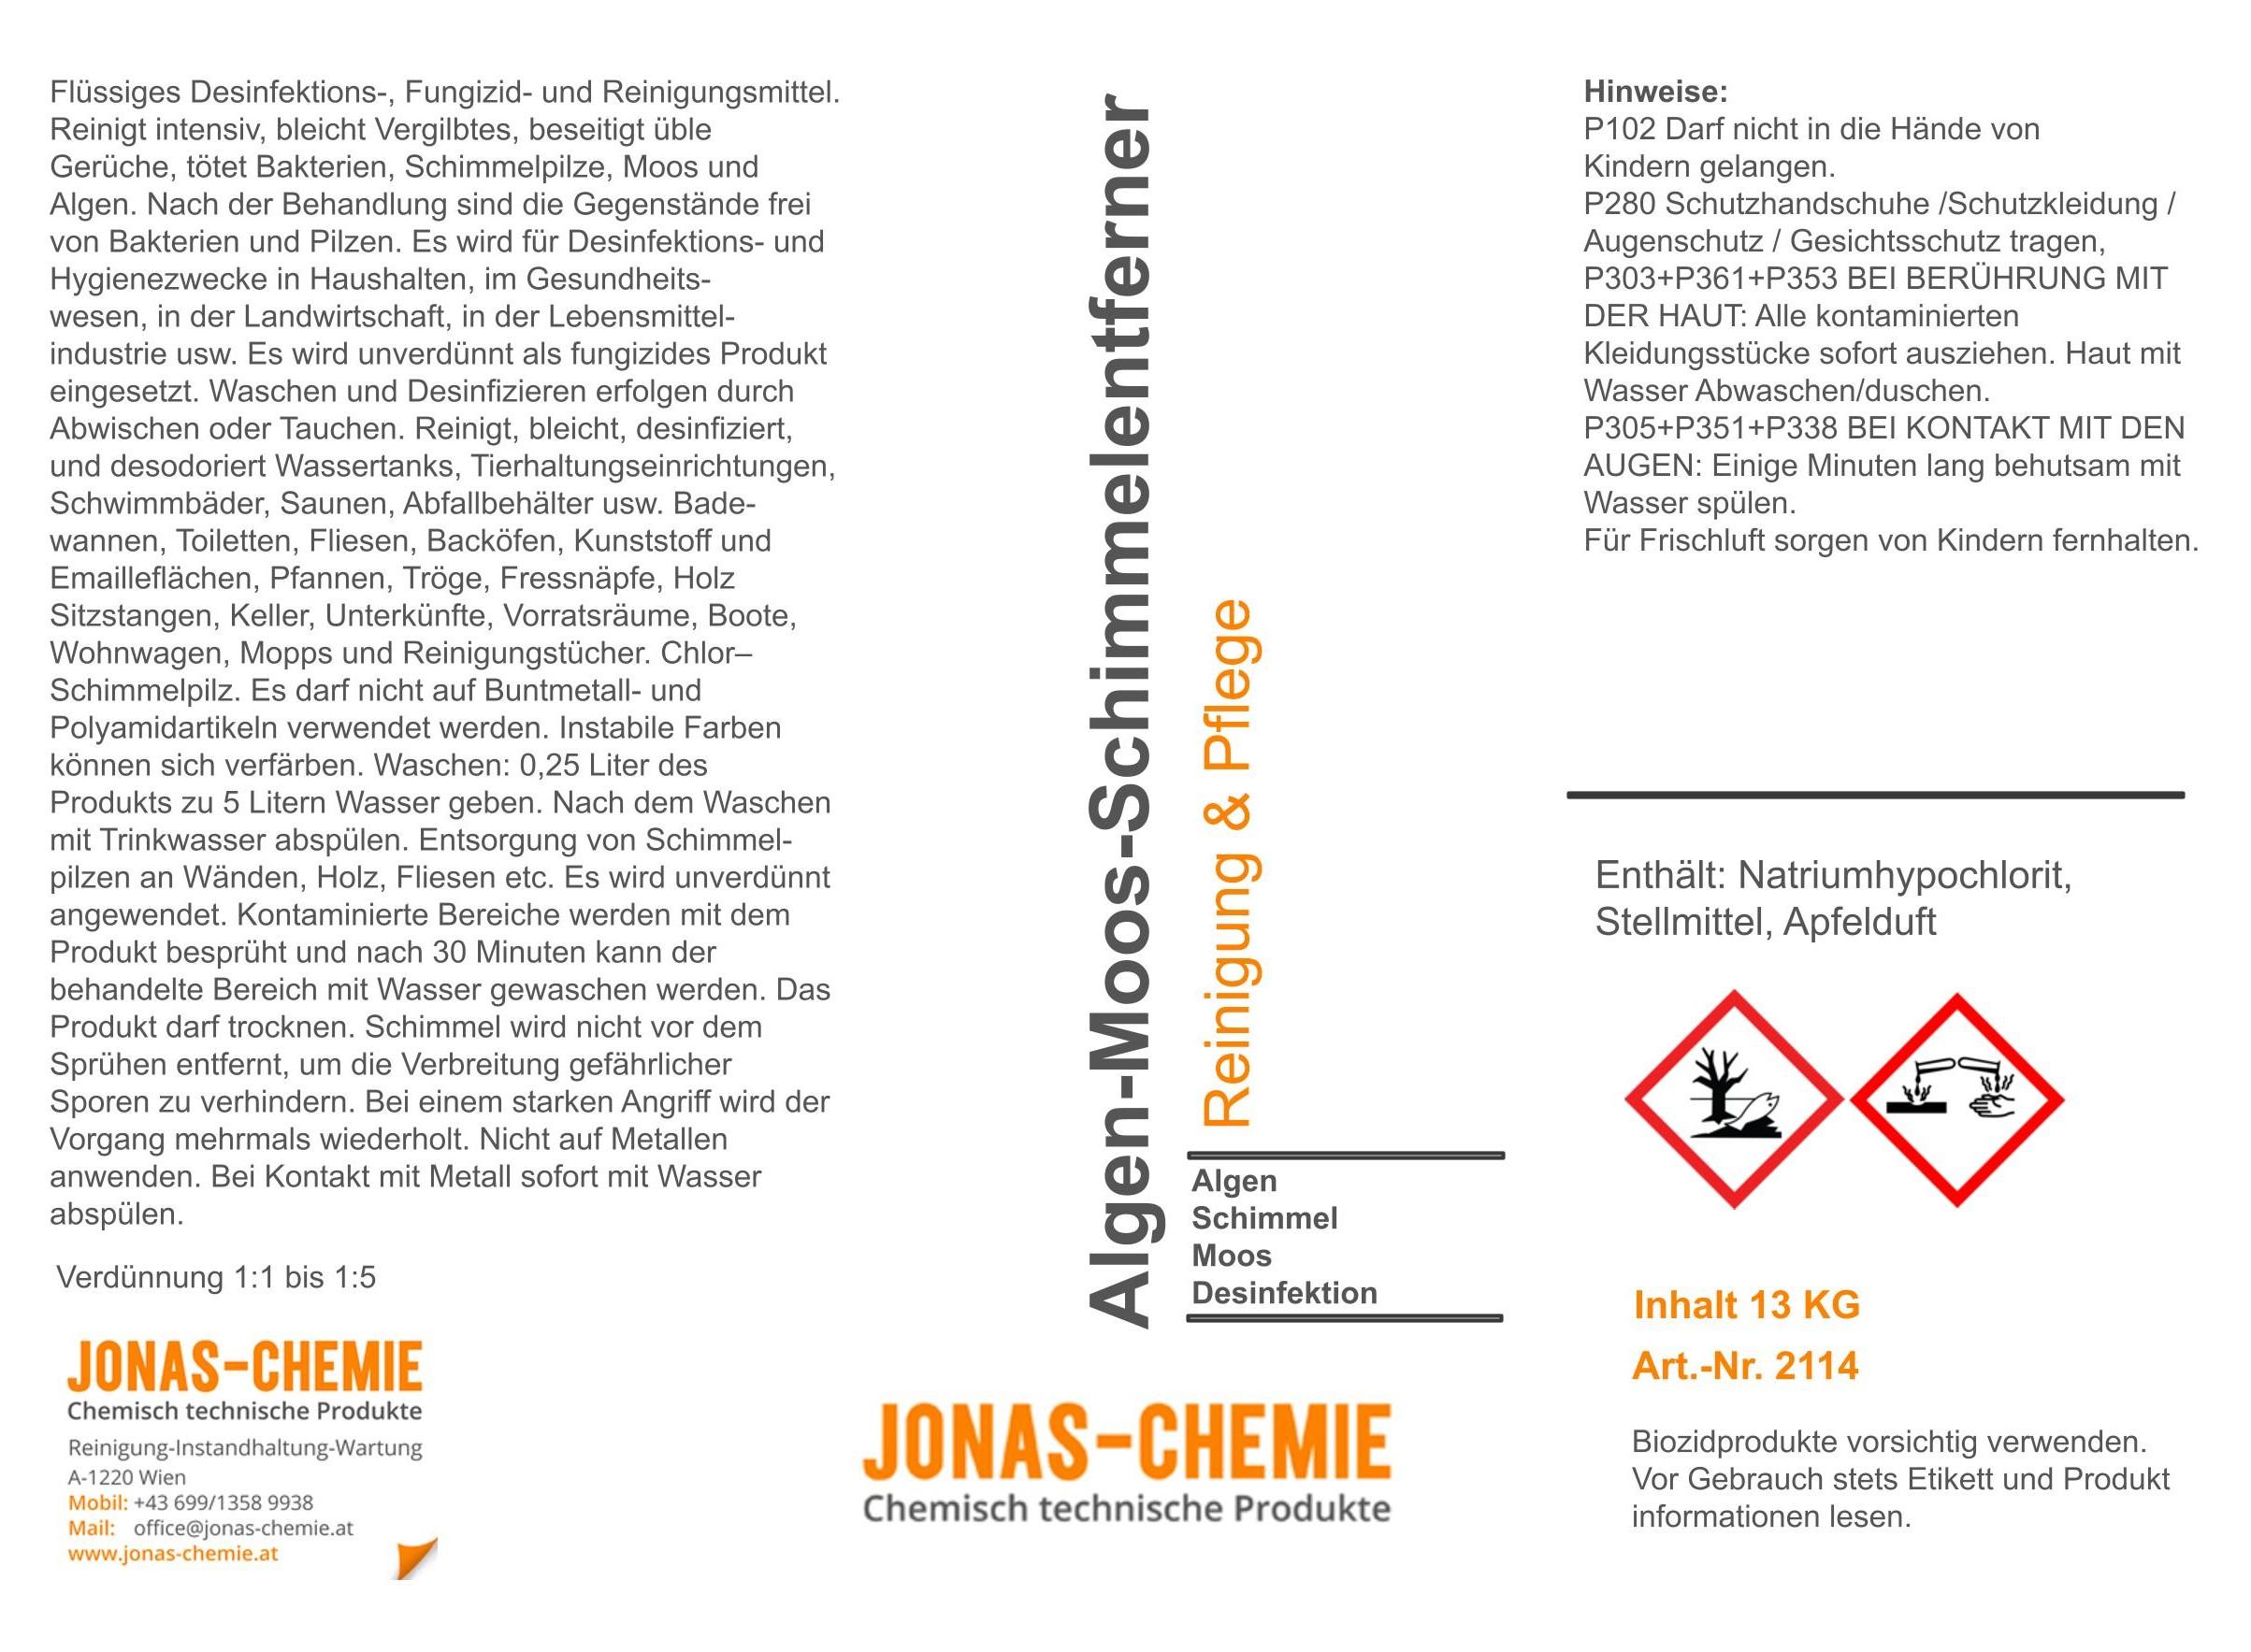 Algen-Moos-Schimmelentferner A5